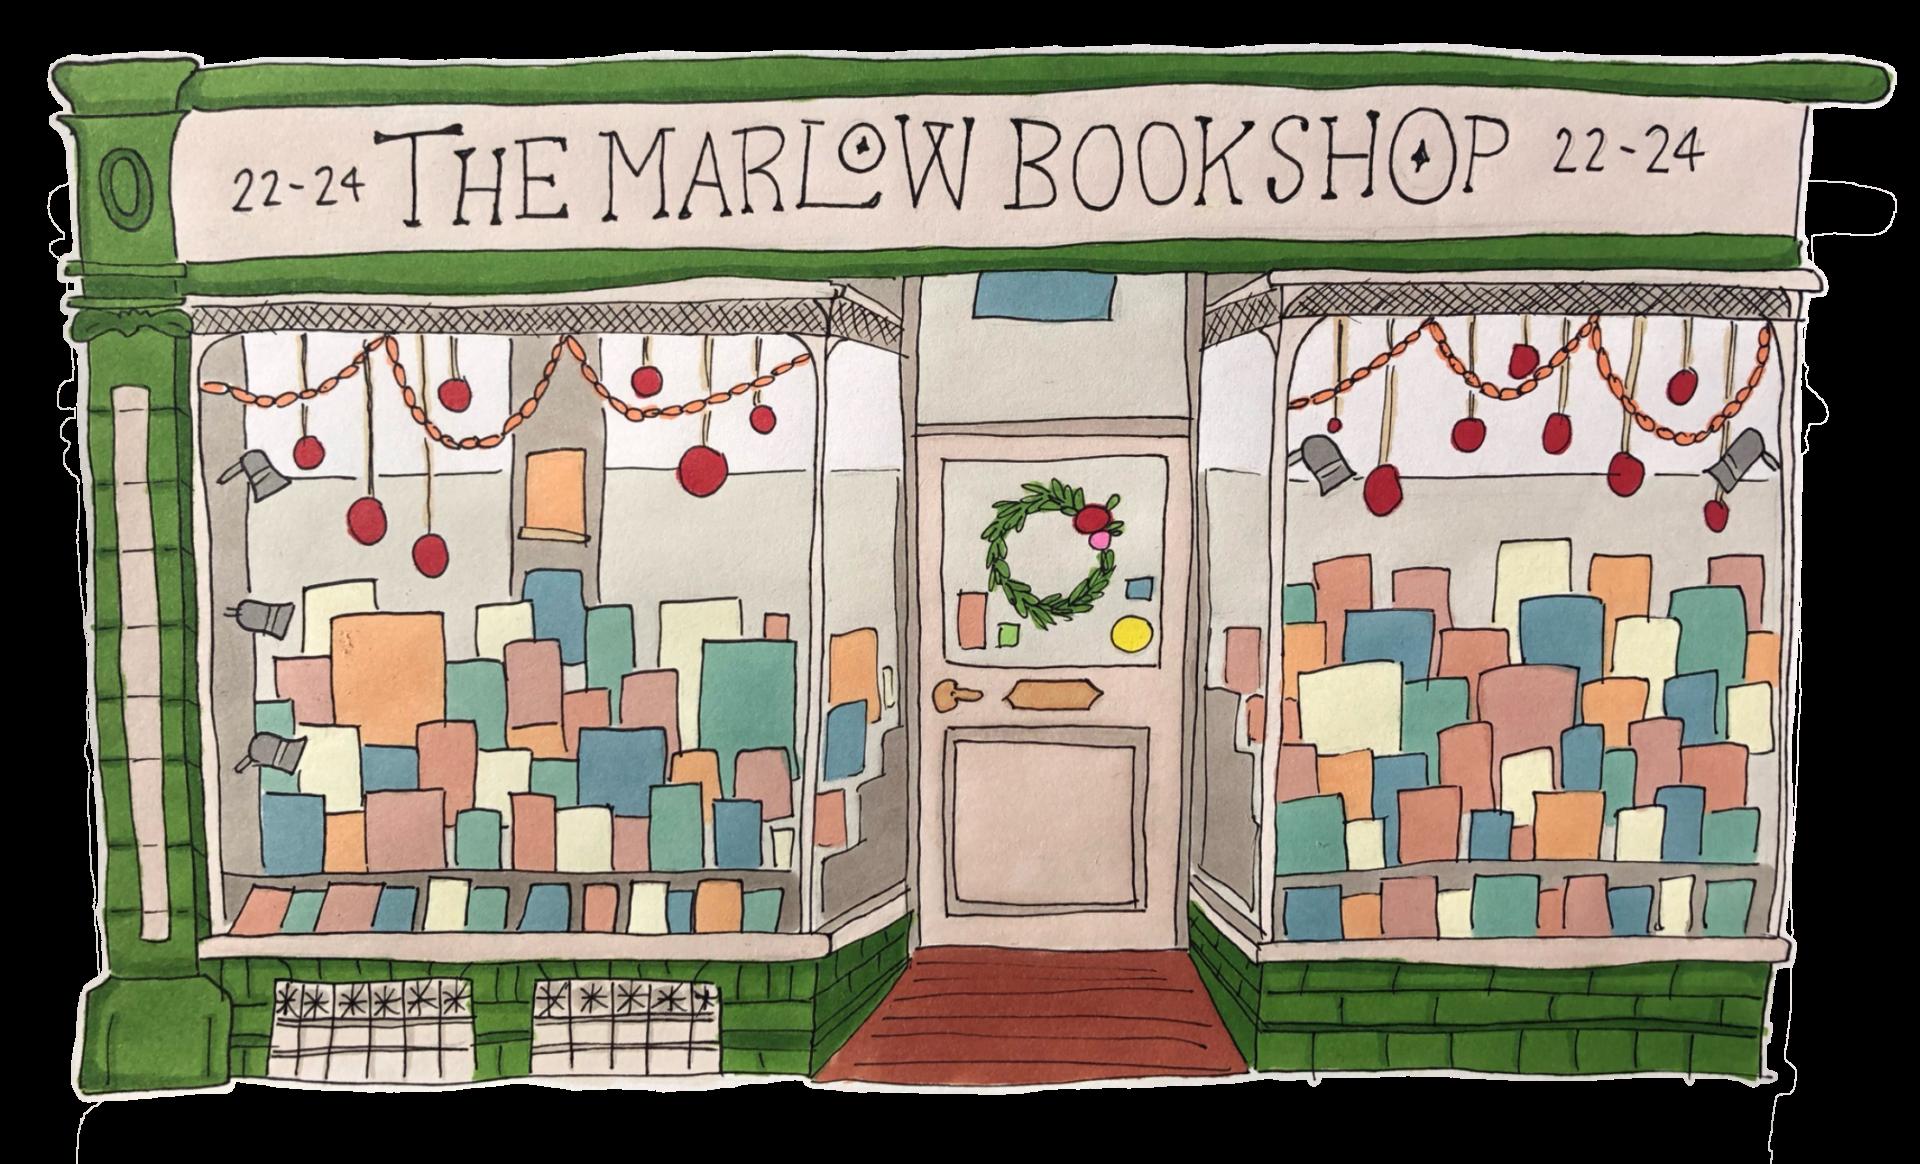 Marlow Bookshop